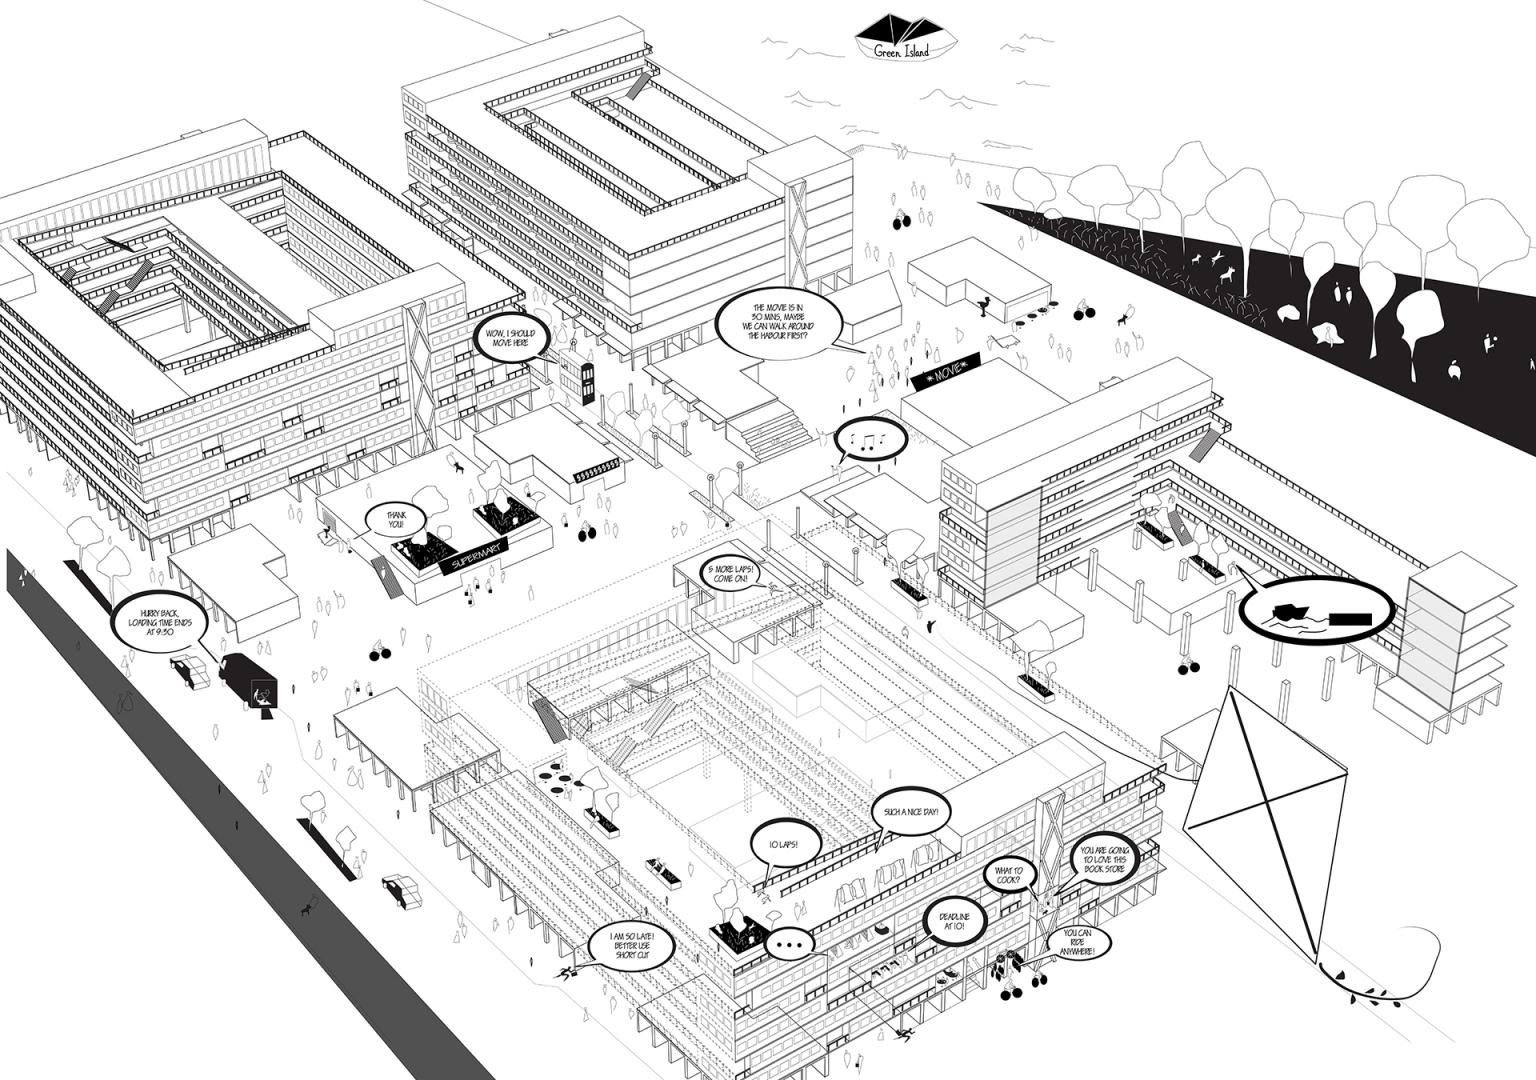 Enlarge Photo: Architecture and Public Ground: Dazibao d'architecture HK 7